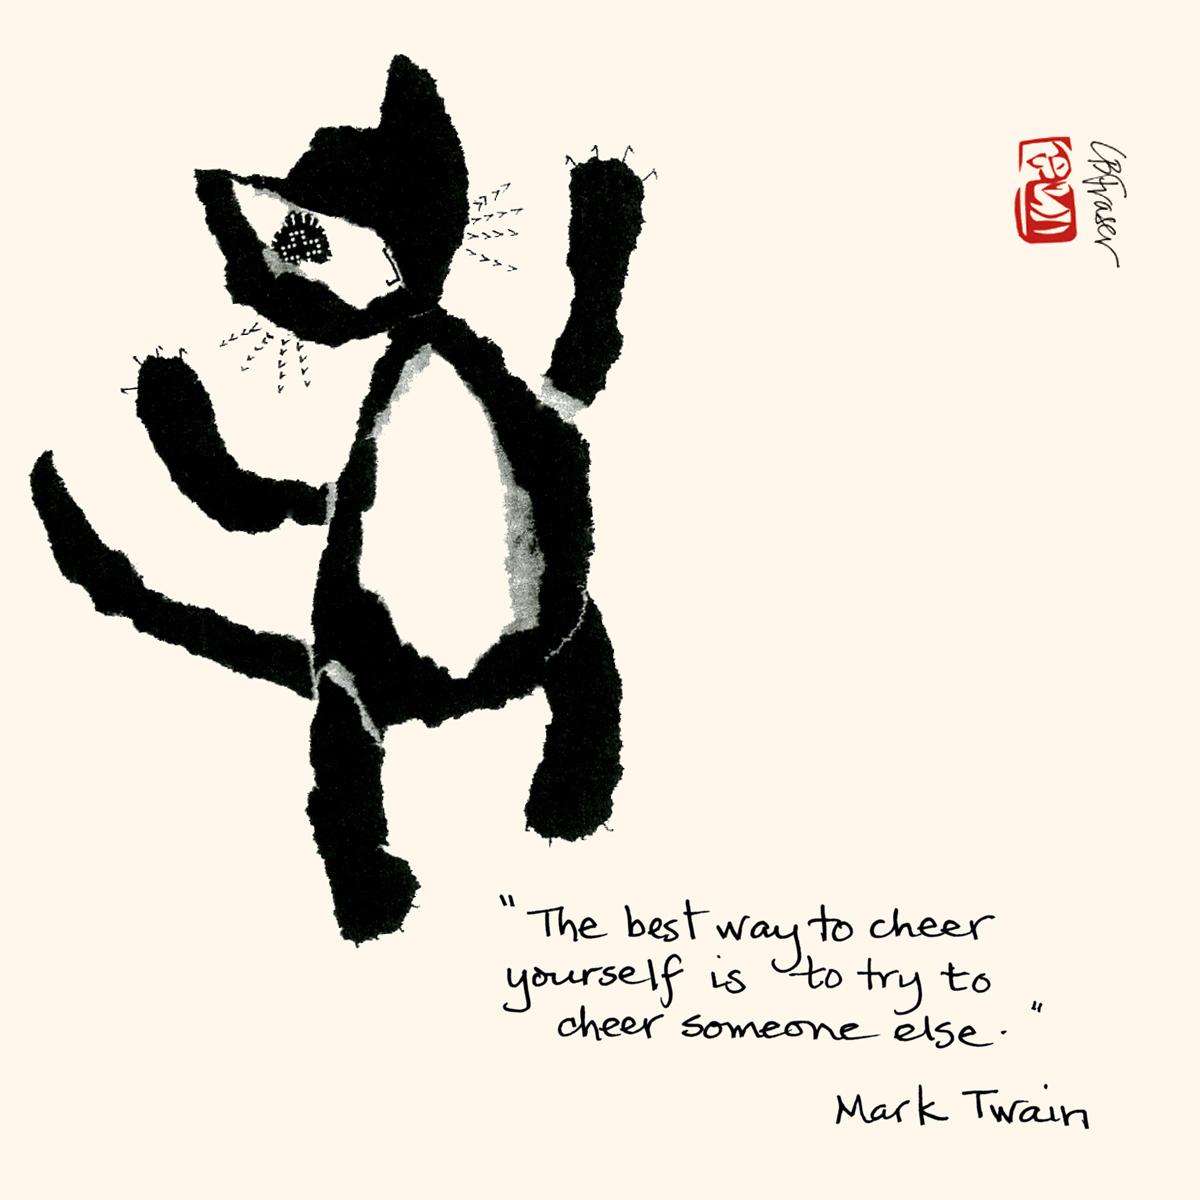 haiku cats on fbf marktwain quotes cheer season